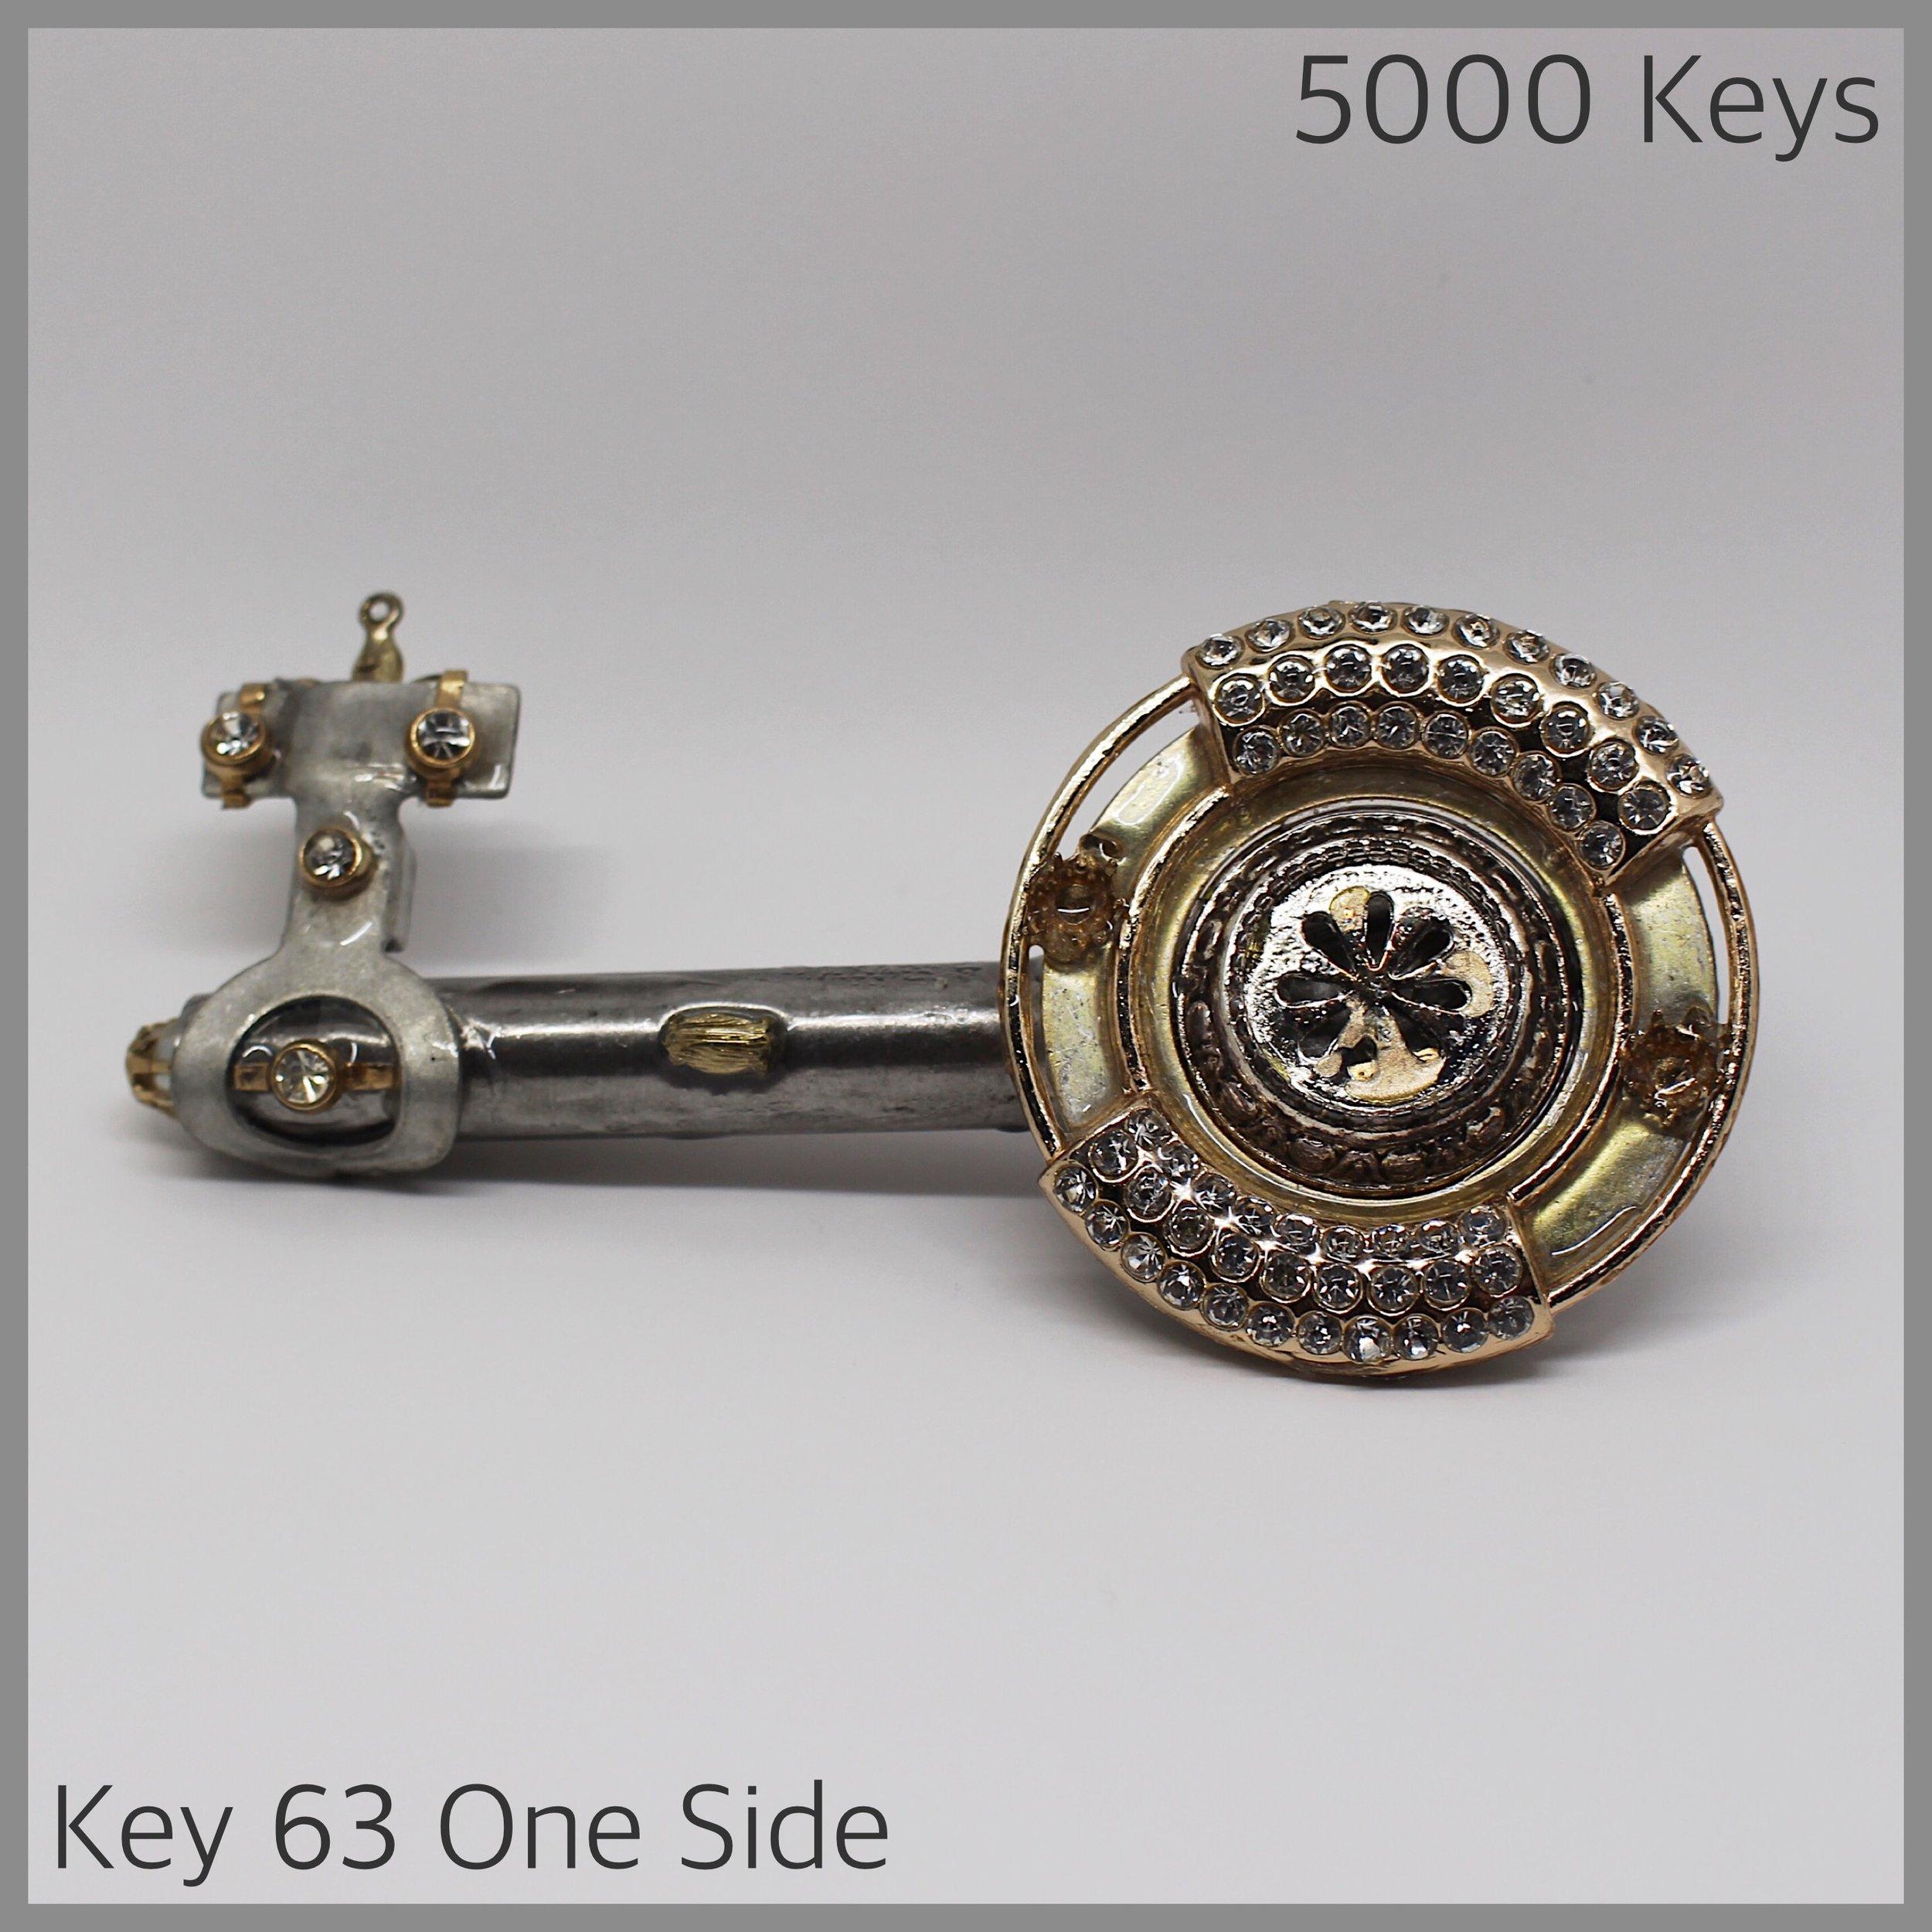 Key 63 one side - 1.JPG